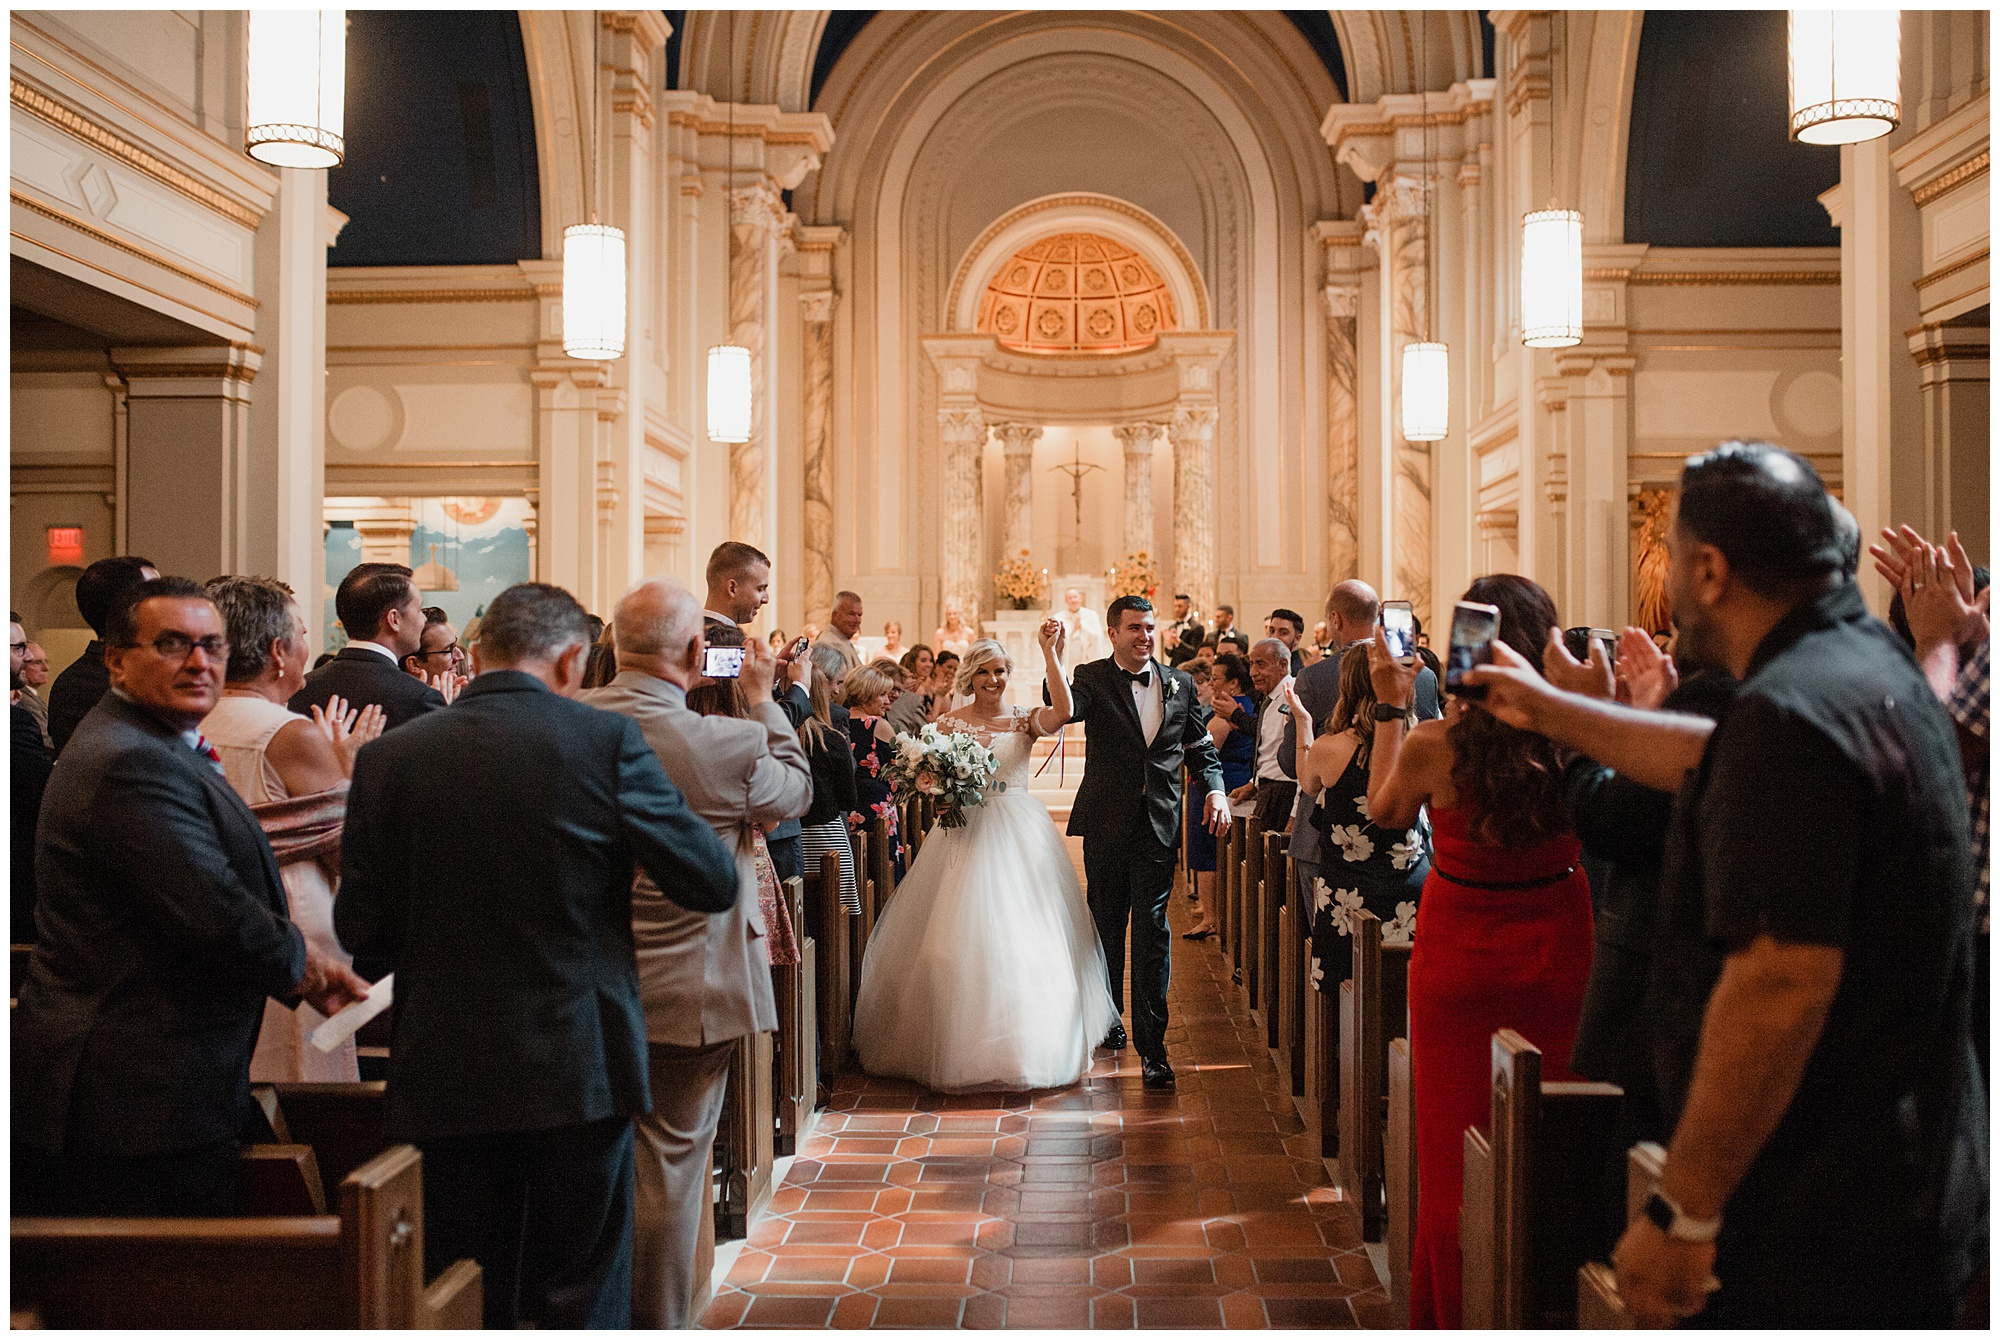 pear_tree_estate_wedding_champaign_il_wright_photographs_jj_0057.jpg